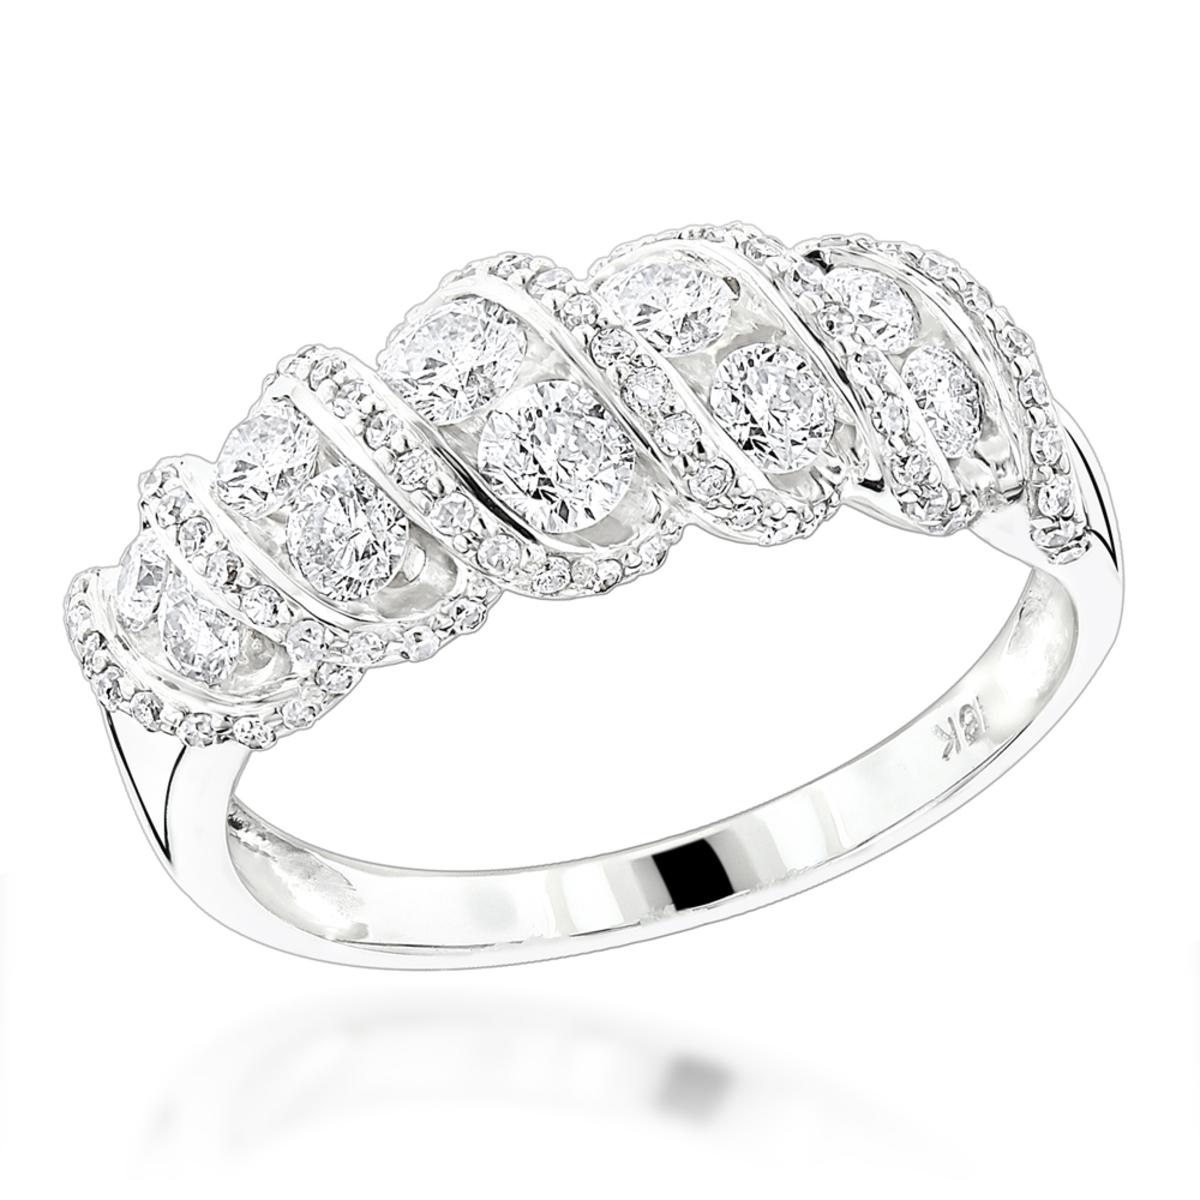 18K Gold Designer Womens Diamond Rings Collection Item 1.5ct